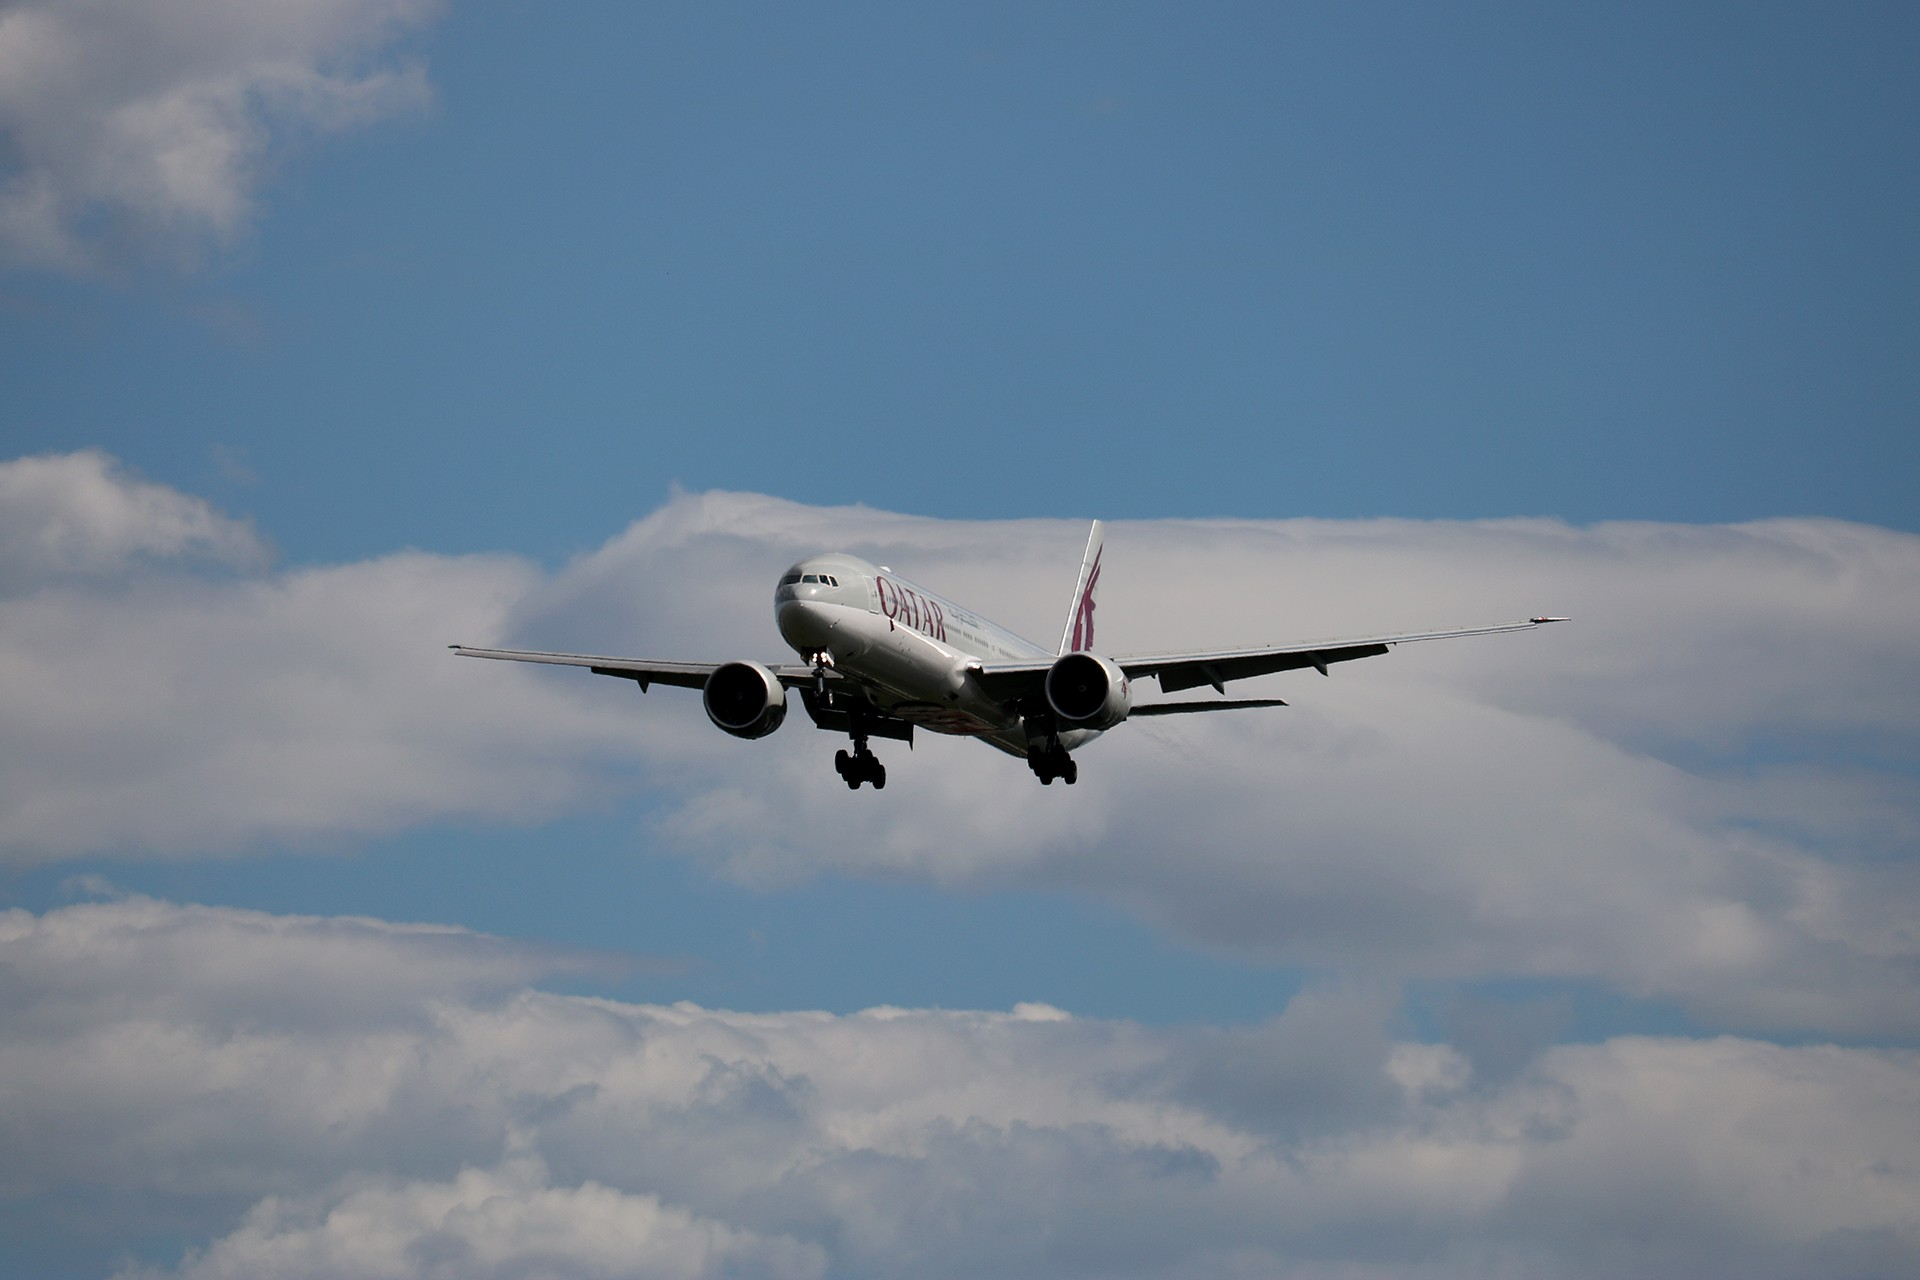 Re:[原创]LIULIU 【PEK 01】 好看的云Ⅳ 杂,很杂,是真的杂 BOEING 777-3DZER A7-BEJ 中国北京首都国际机场